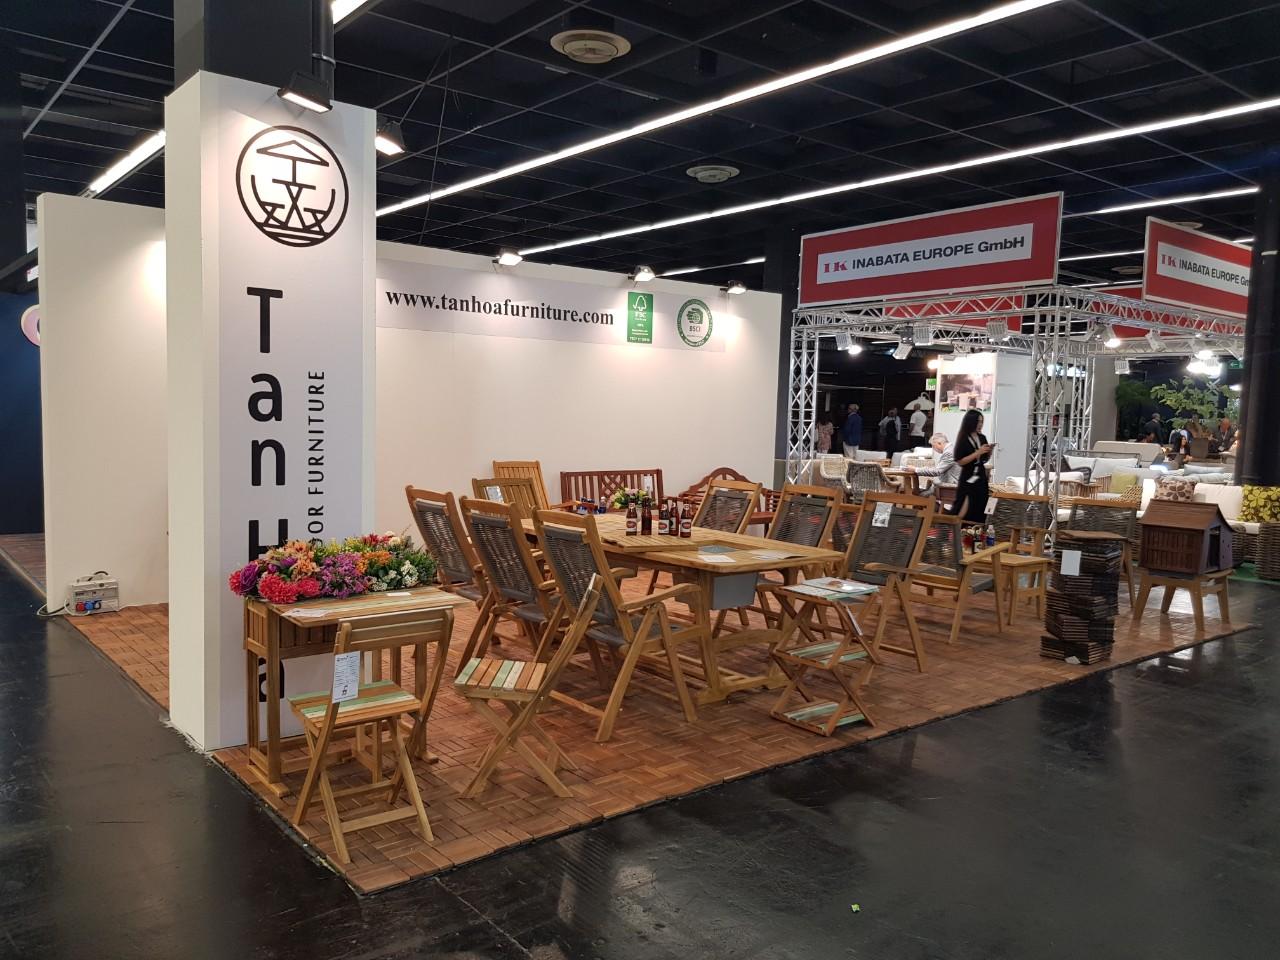 Spoga Exhibition in Germarny 2018